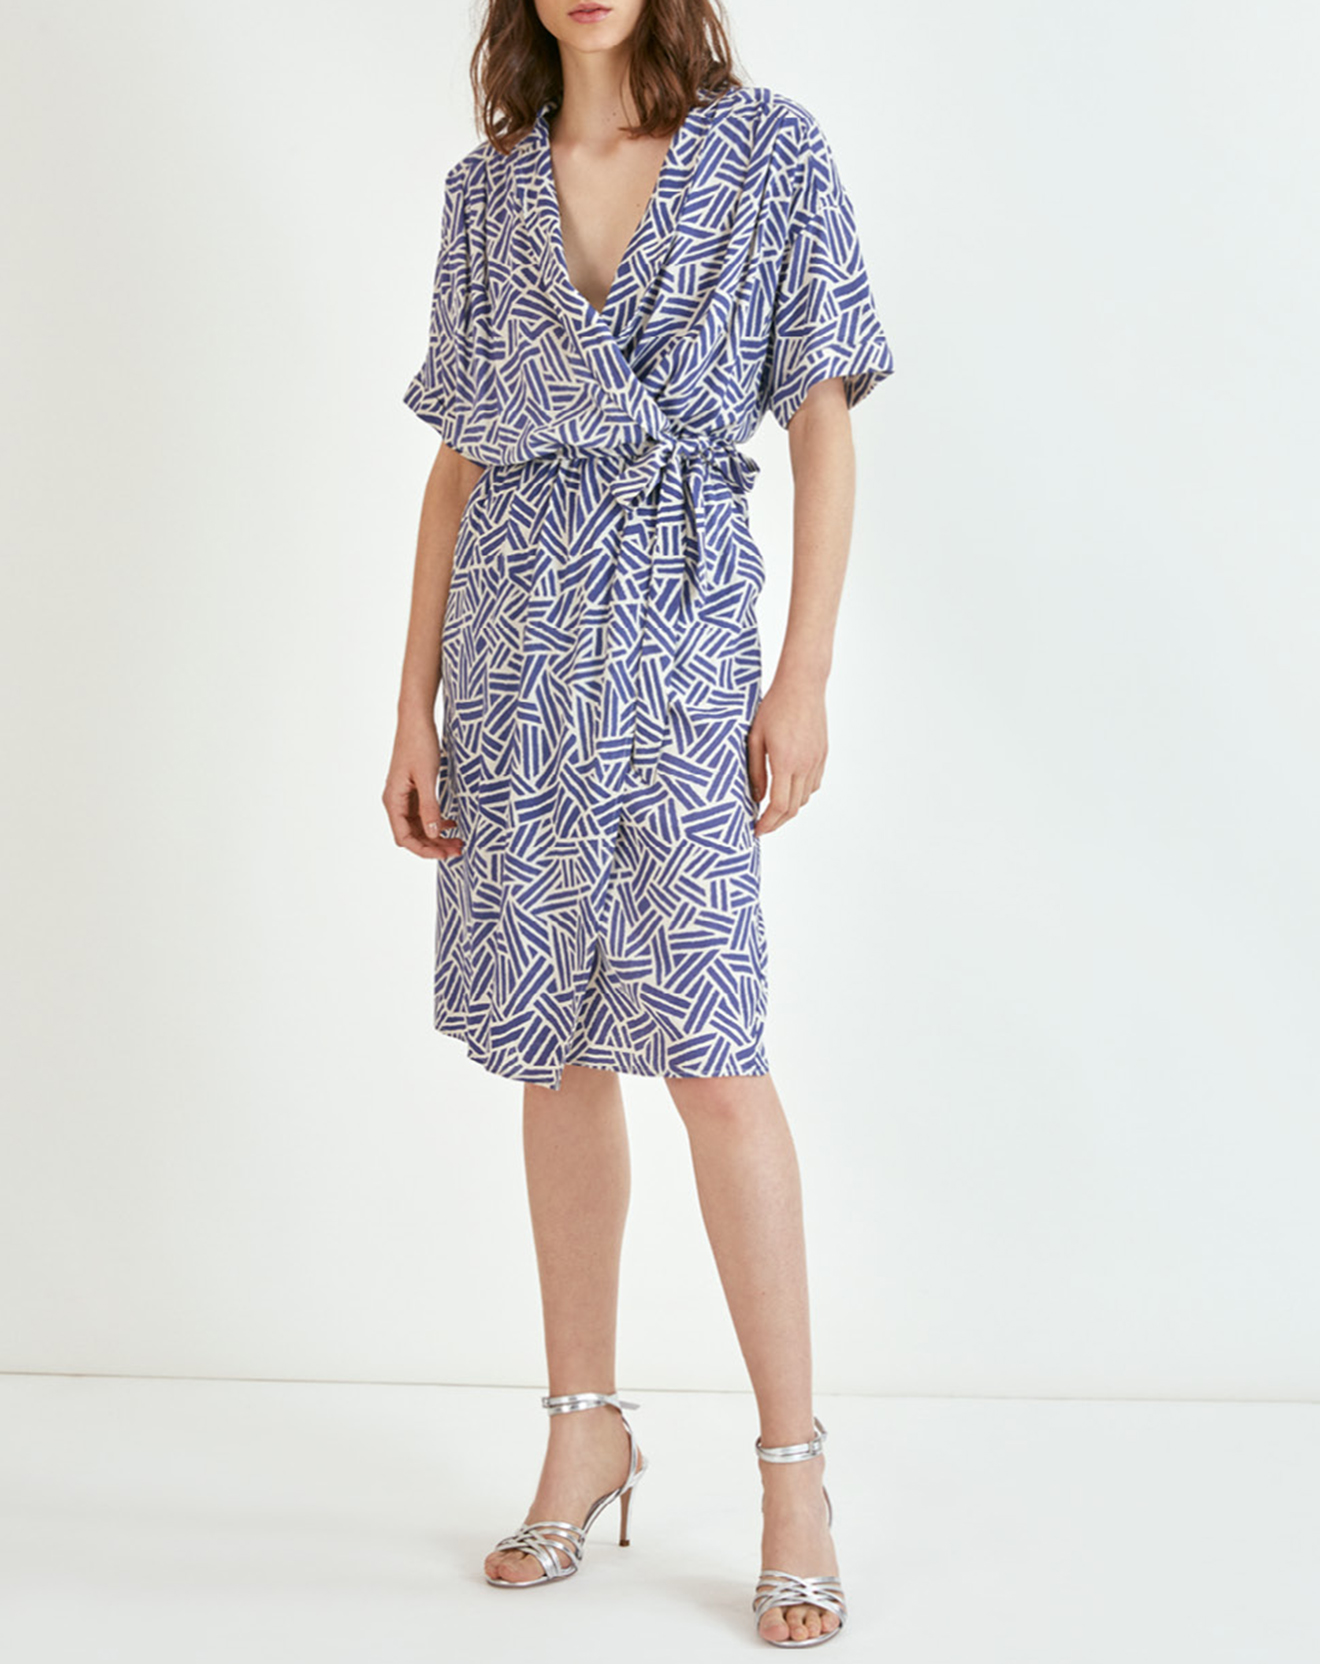 Robe en Lin mélangé Charly imprimée bleue - Suncoo - Modalova